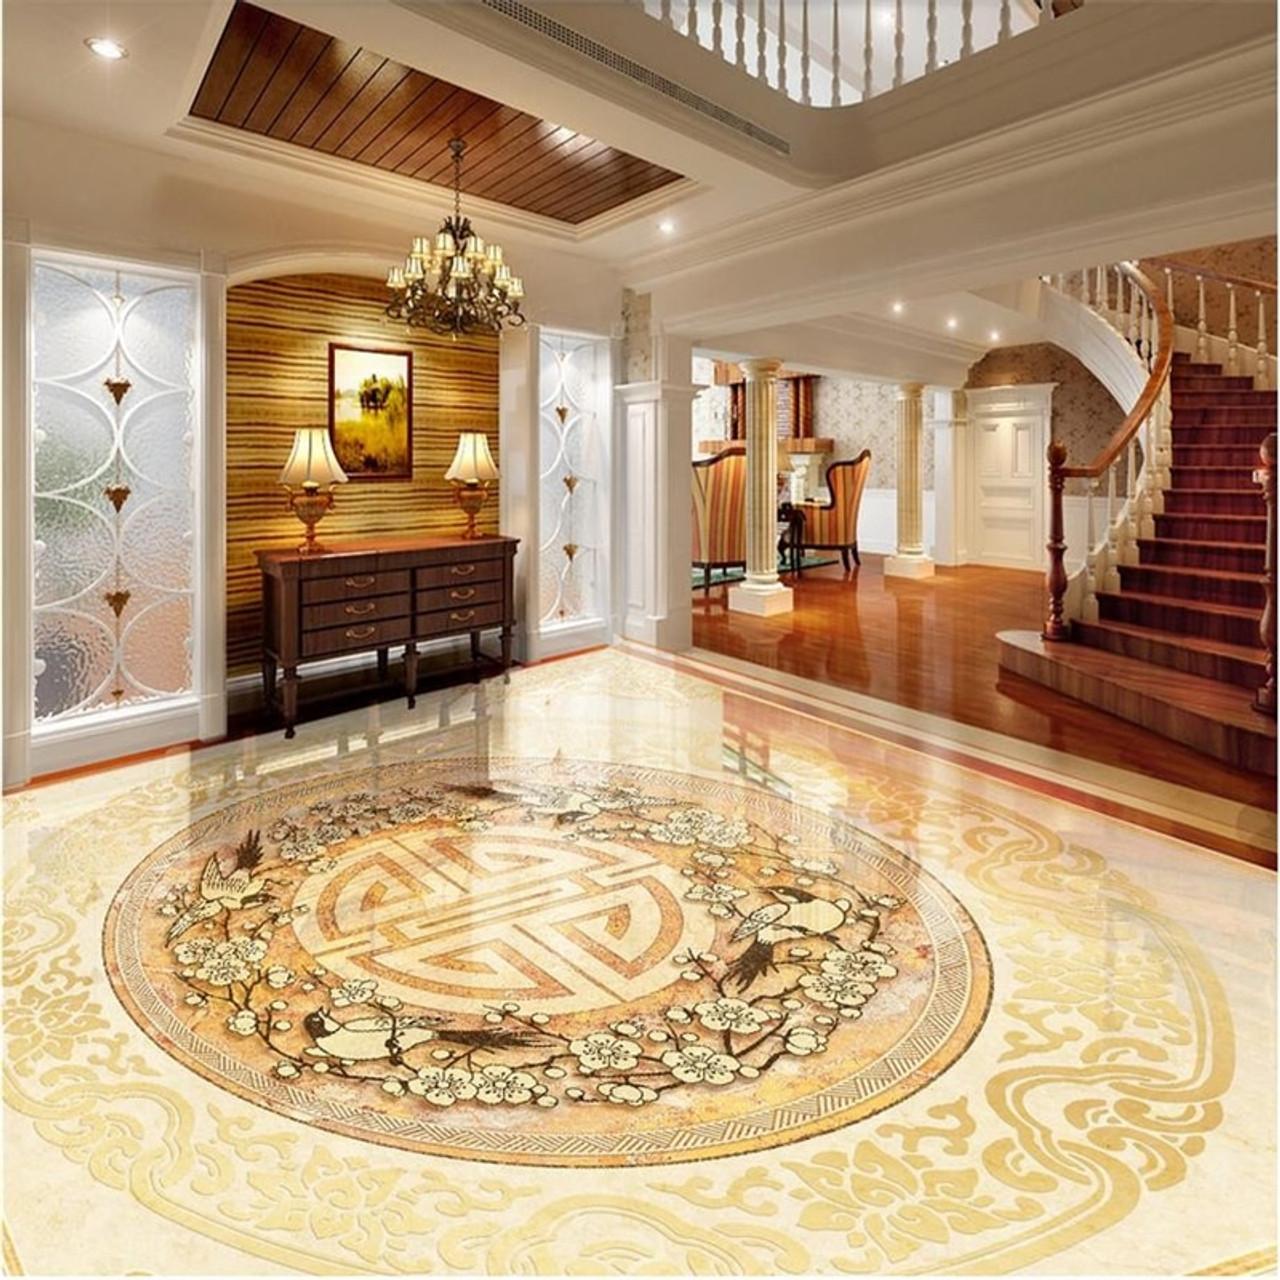 Beibehang Photo Floor Wallpaper 3d Stereoscopic Marble 3d Stereoscopic Wallpaper Floor 3d Wall Mural Flooring